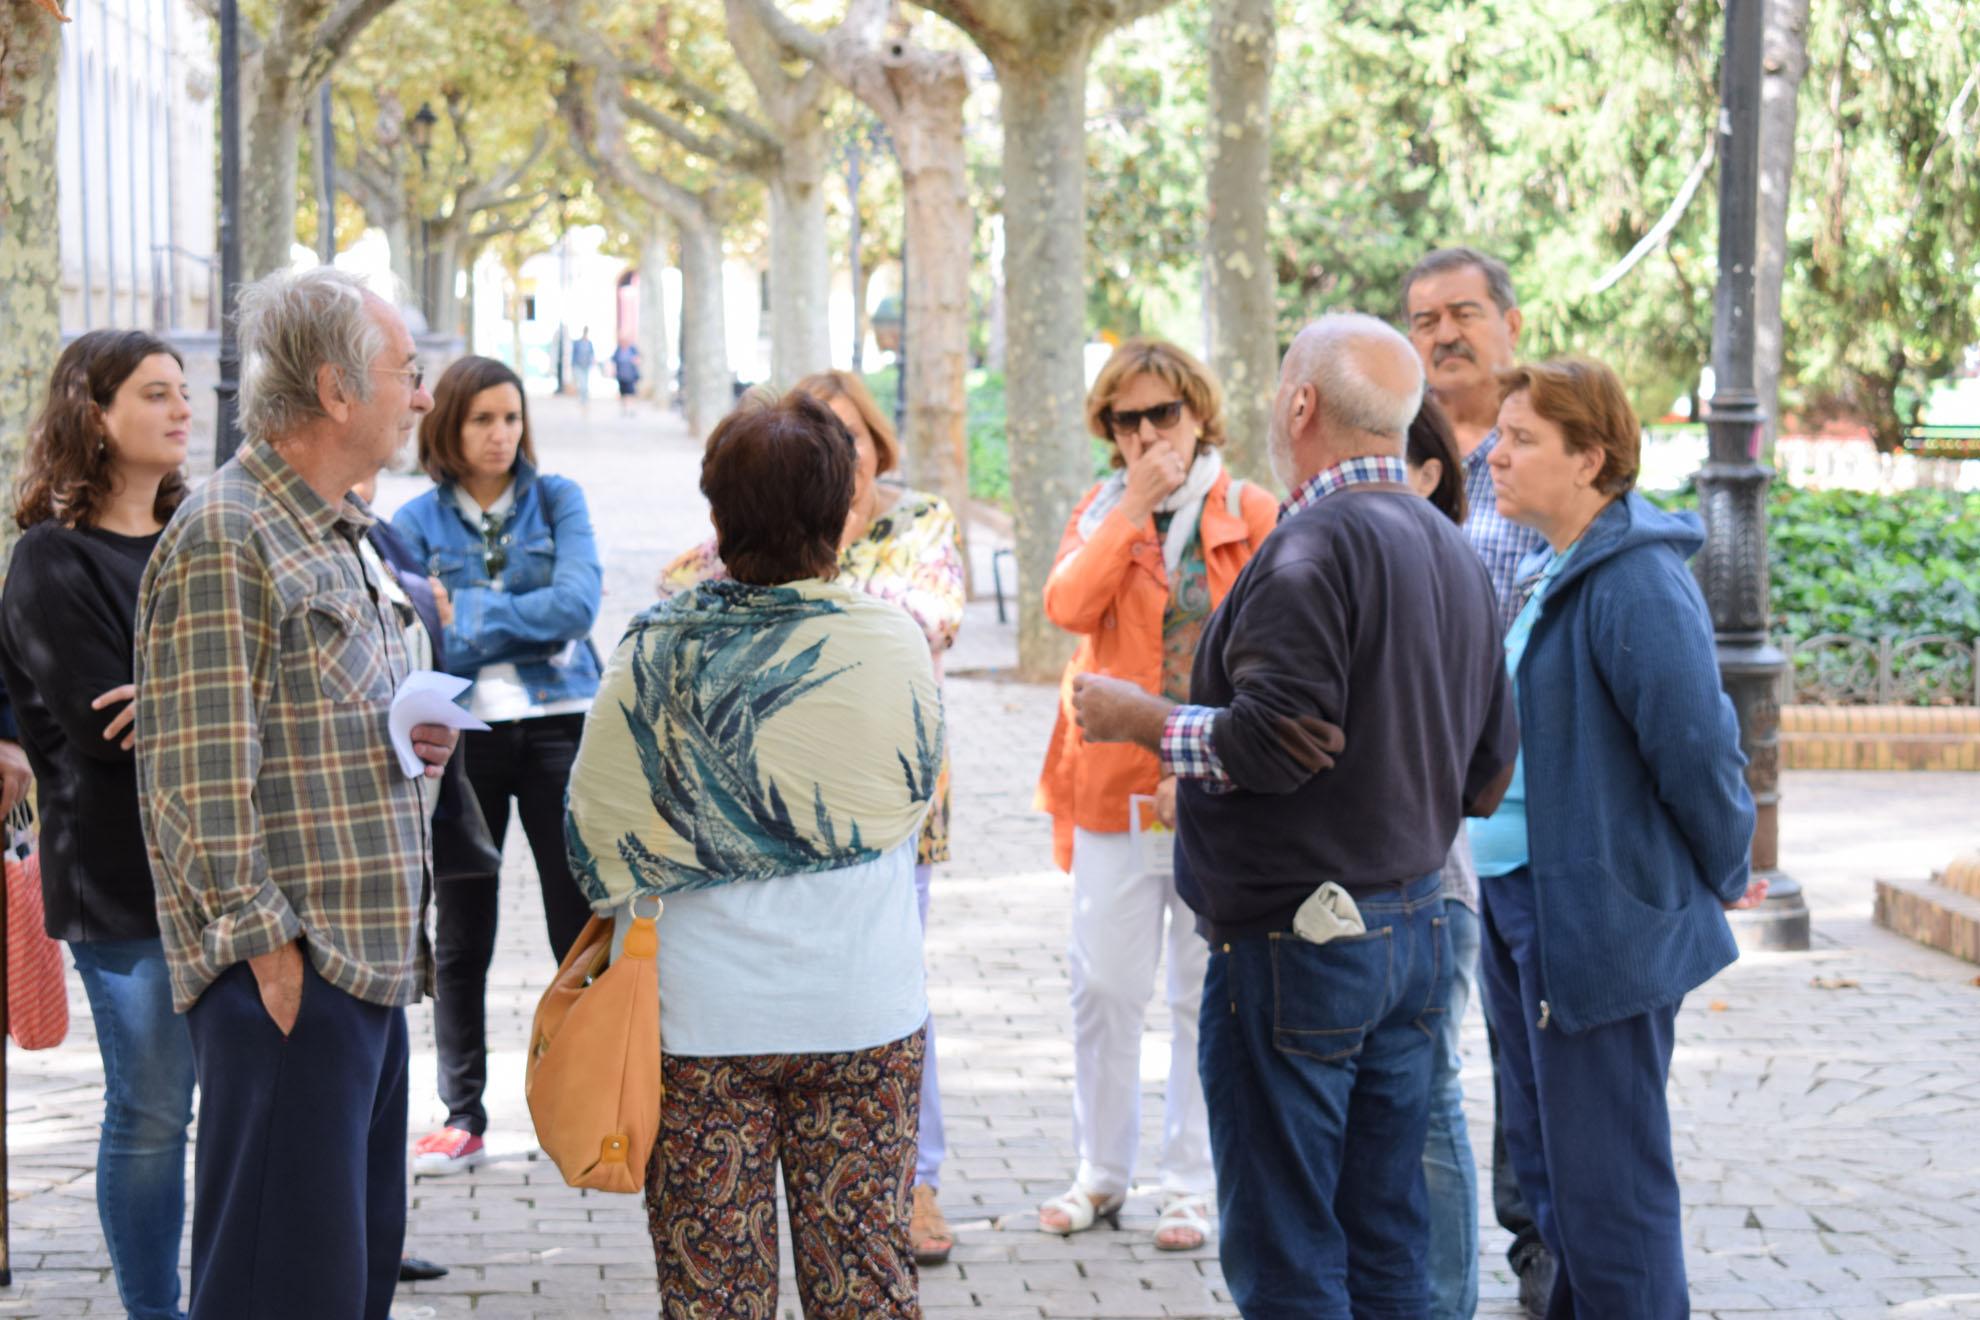 SEMANA-ARQUITECTURA-COAR-FCAR-paseo-espolon-glorieta-plaza-ayuntamiento-jose-miguel-leon (17-)